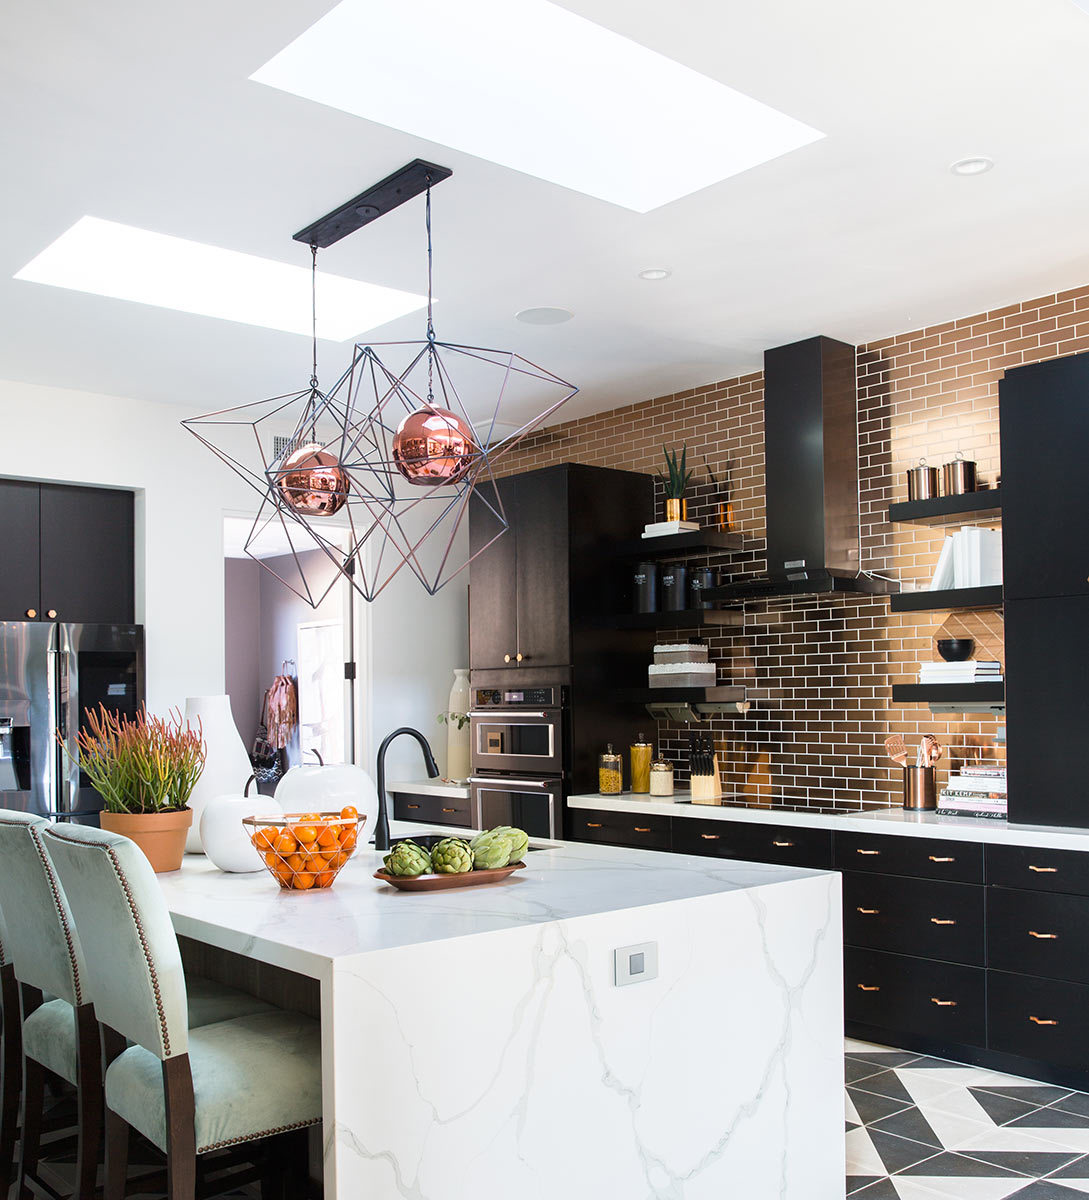 Hgtv Home Design Ideas: HGTV Smart Home Featuring Smart Skylights